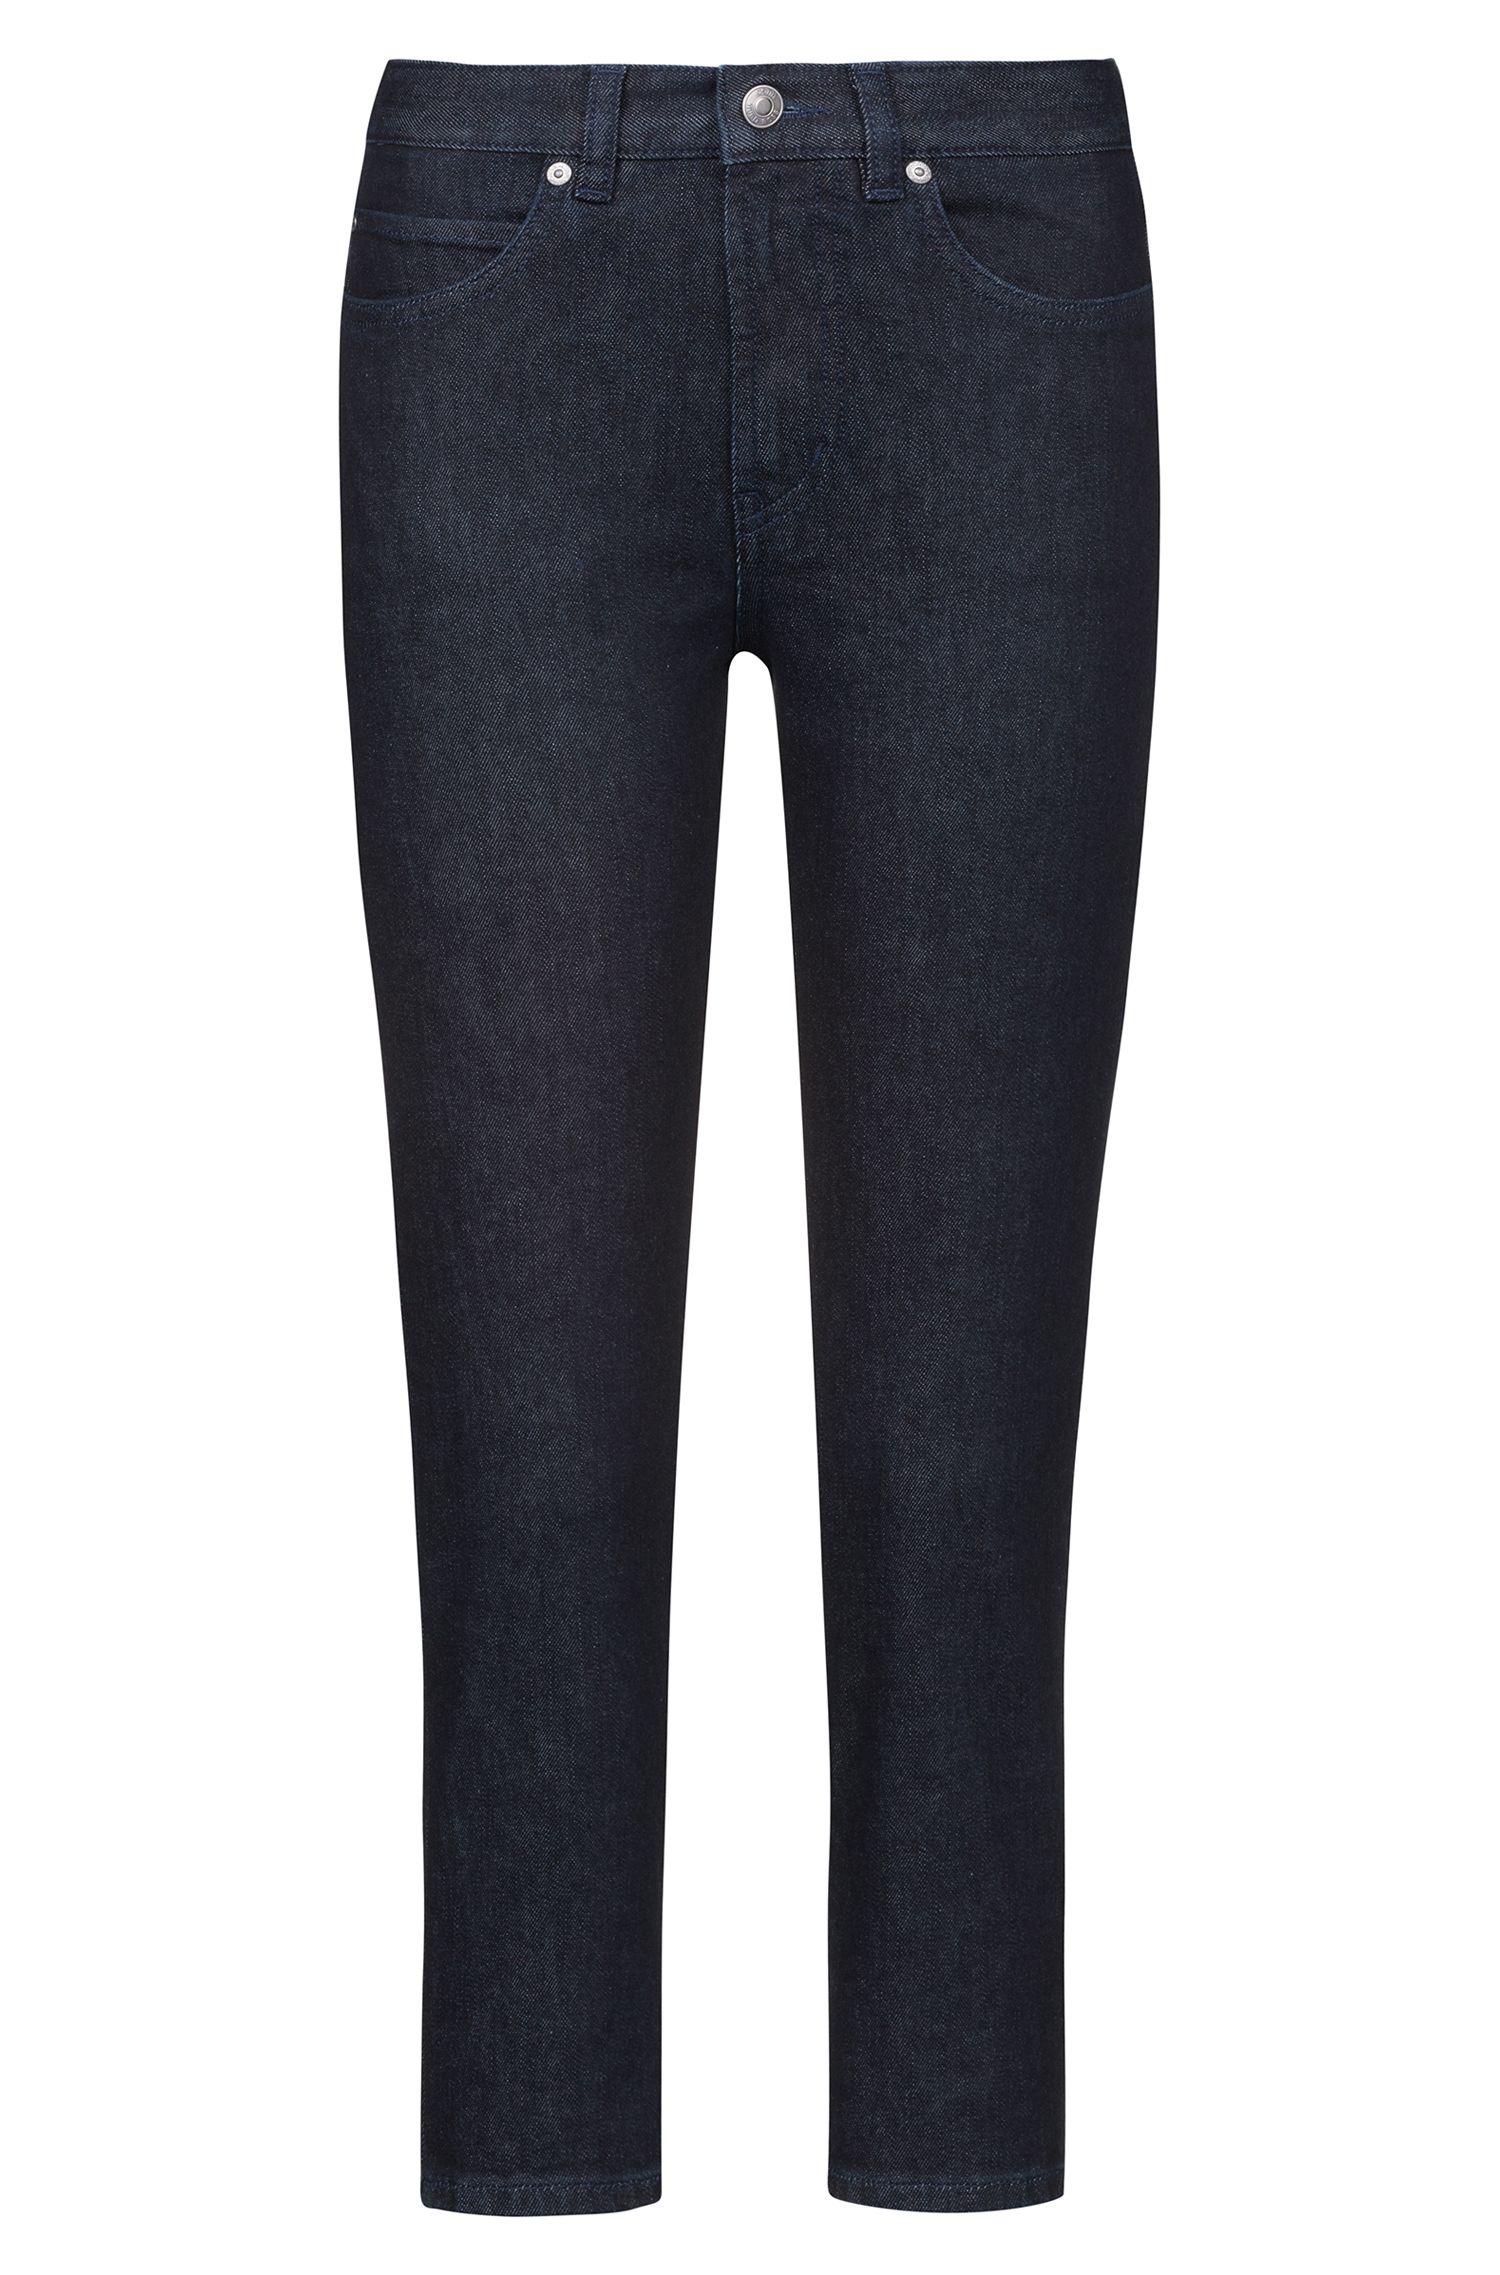 Kortere slim-fit jeans met gespiegeld, kunstzinnig logo, Donkerblauw